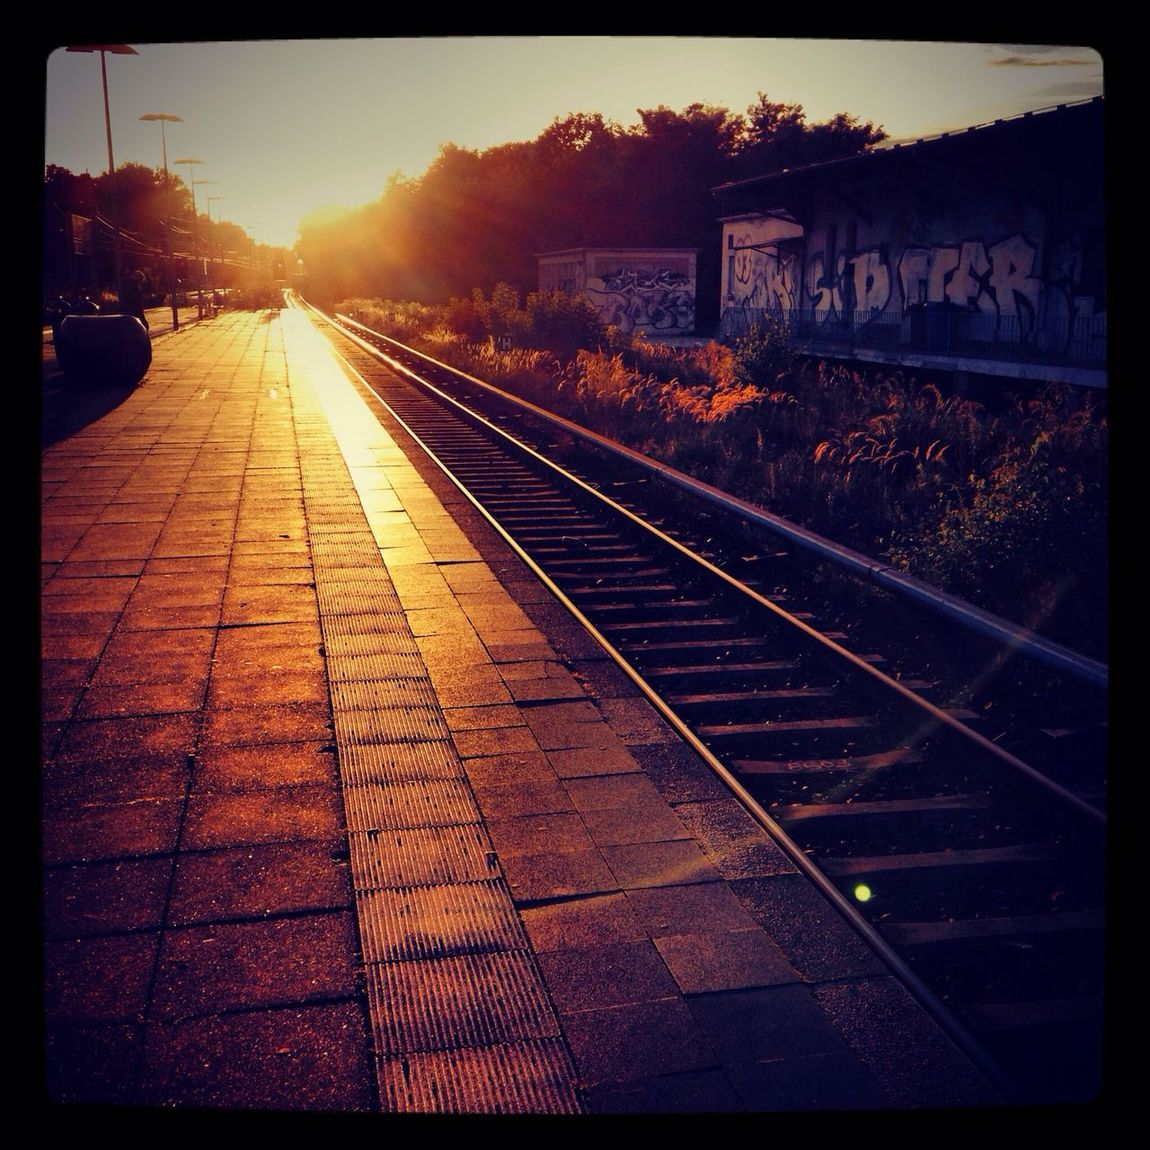 sundown at sbahn griebnitzsee